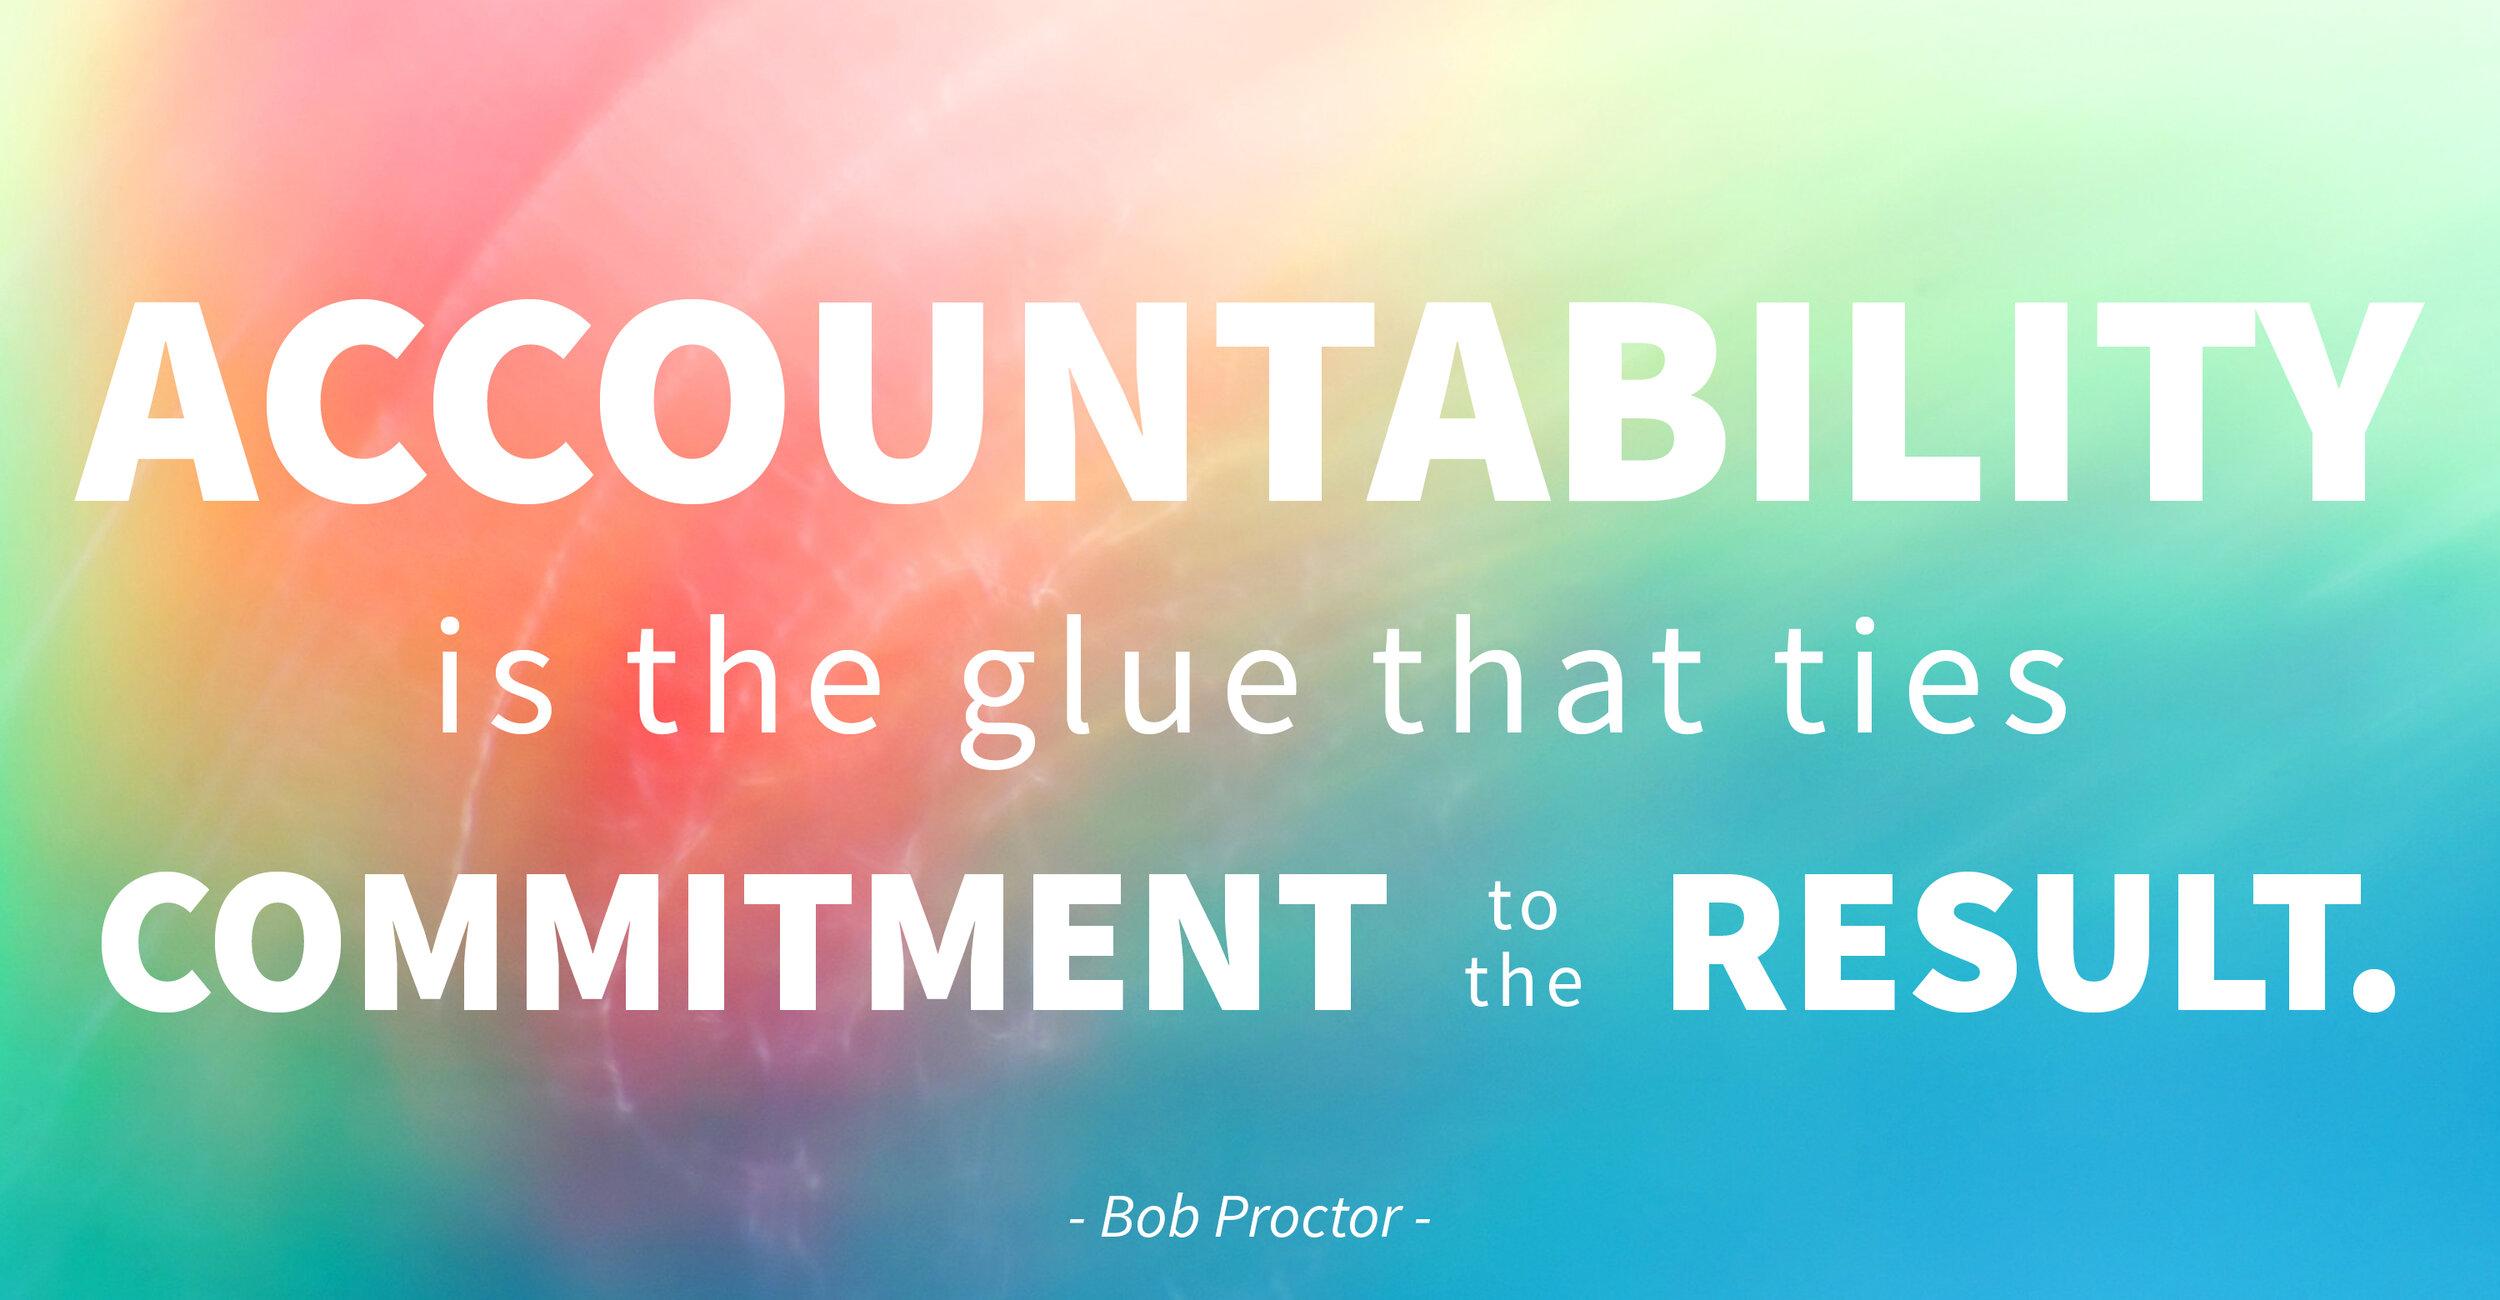 MM 091619 Accountability.jpg